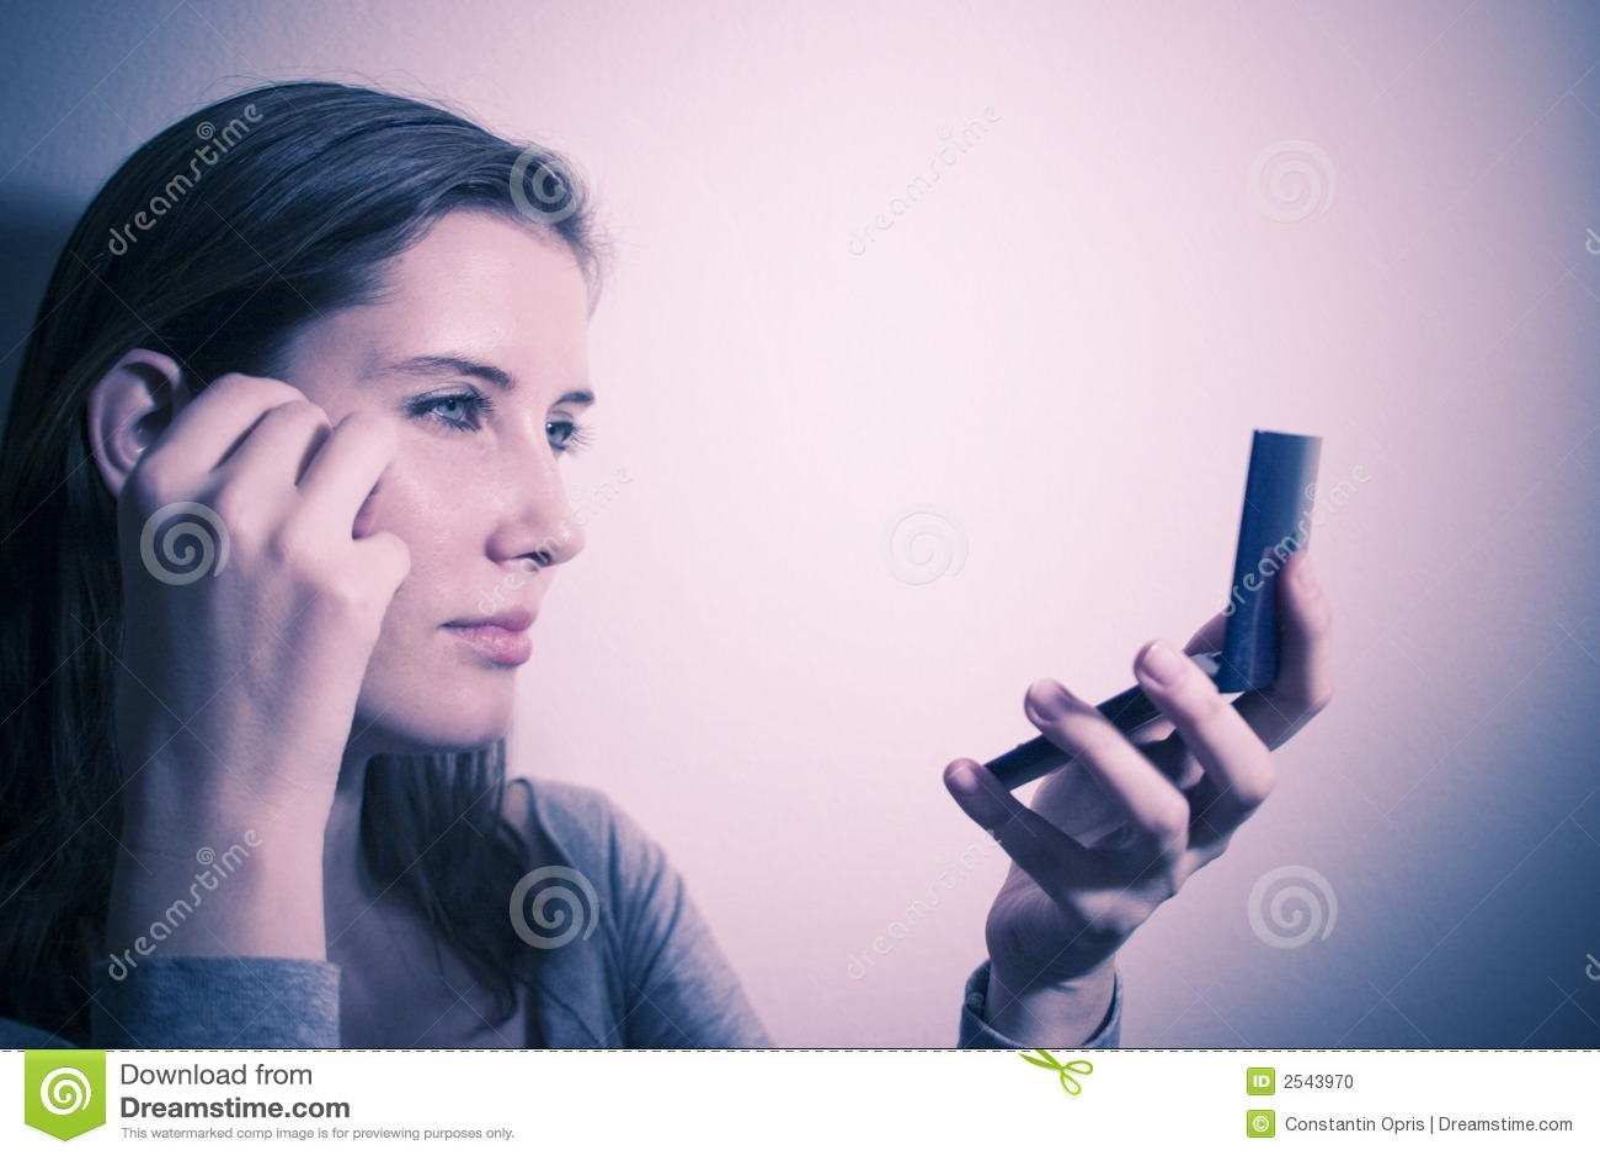 Woman checking makeup